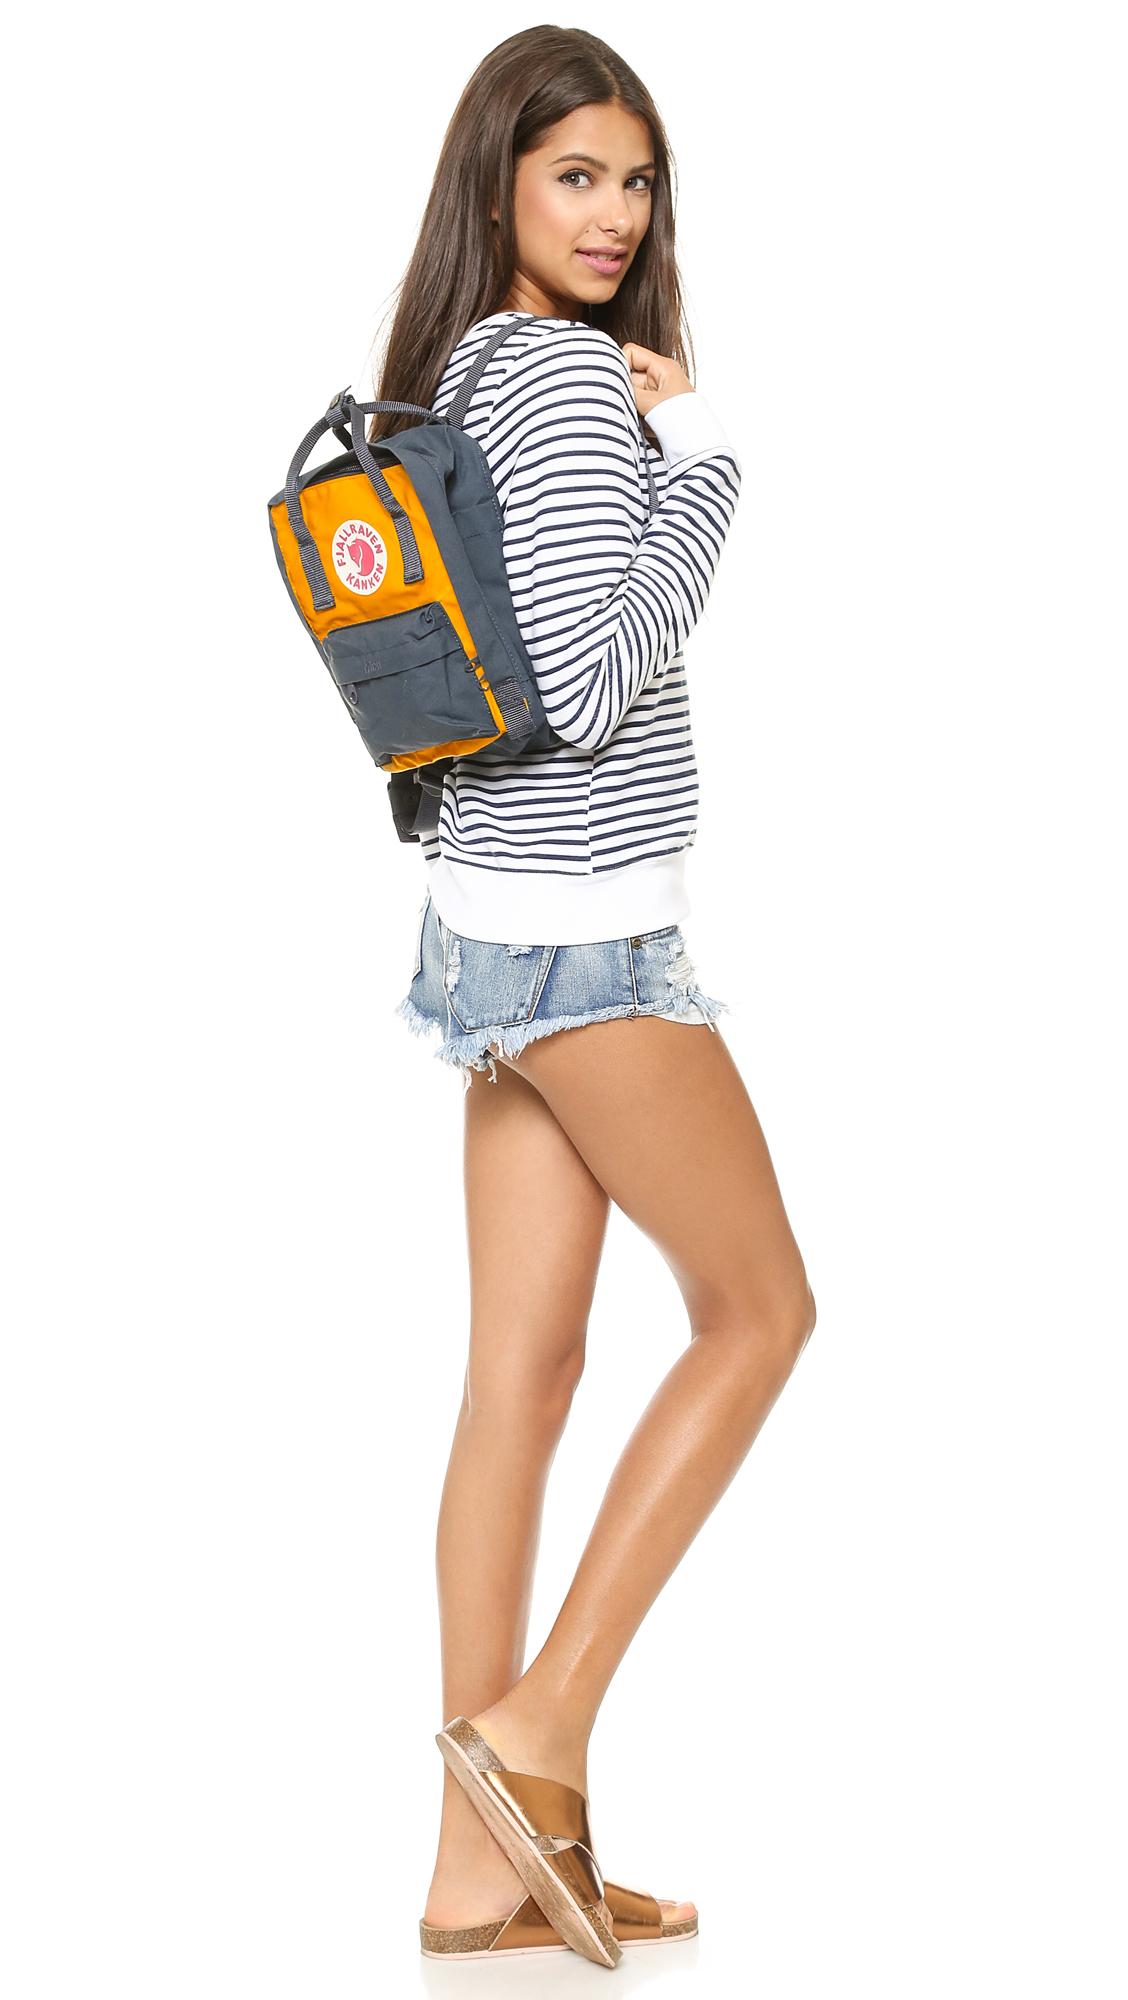 56b82ebc2a Fjallraven Kanken Mini Backpack - Navy warm Yellow in Yellow - Lyst